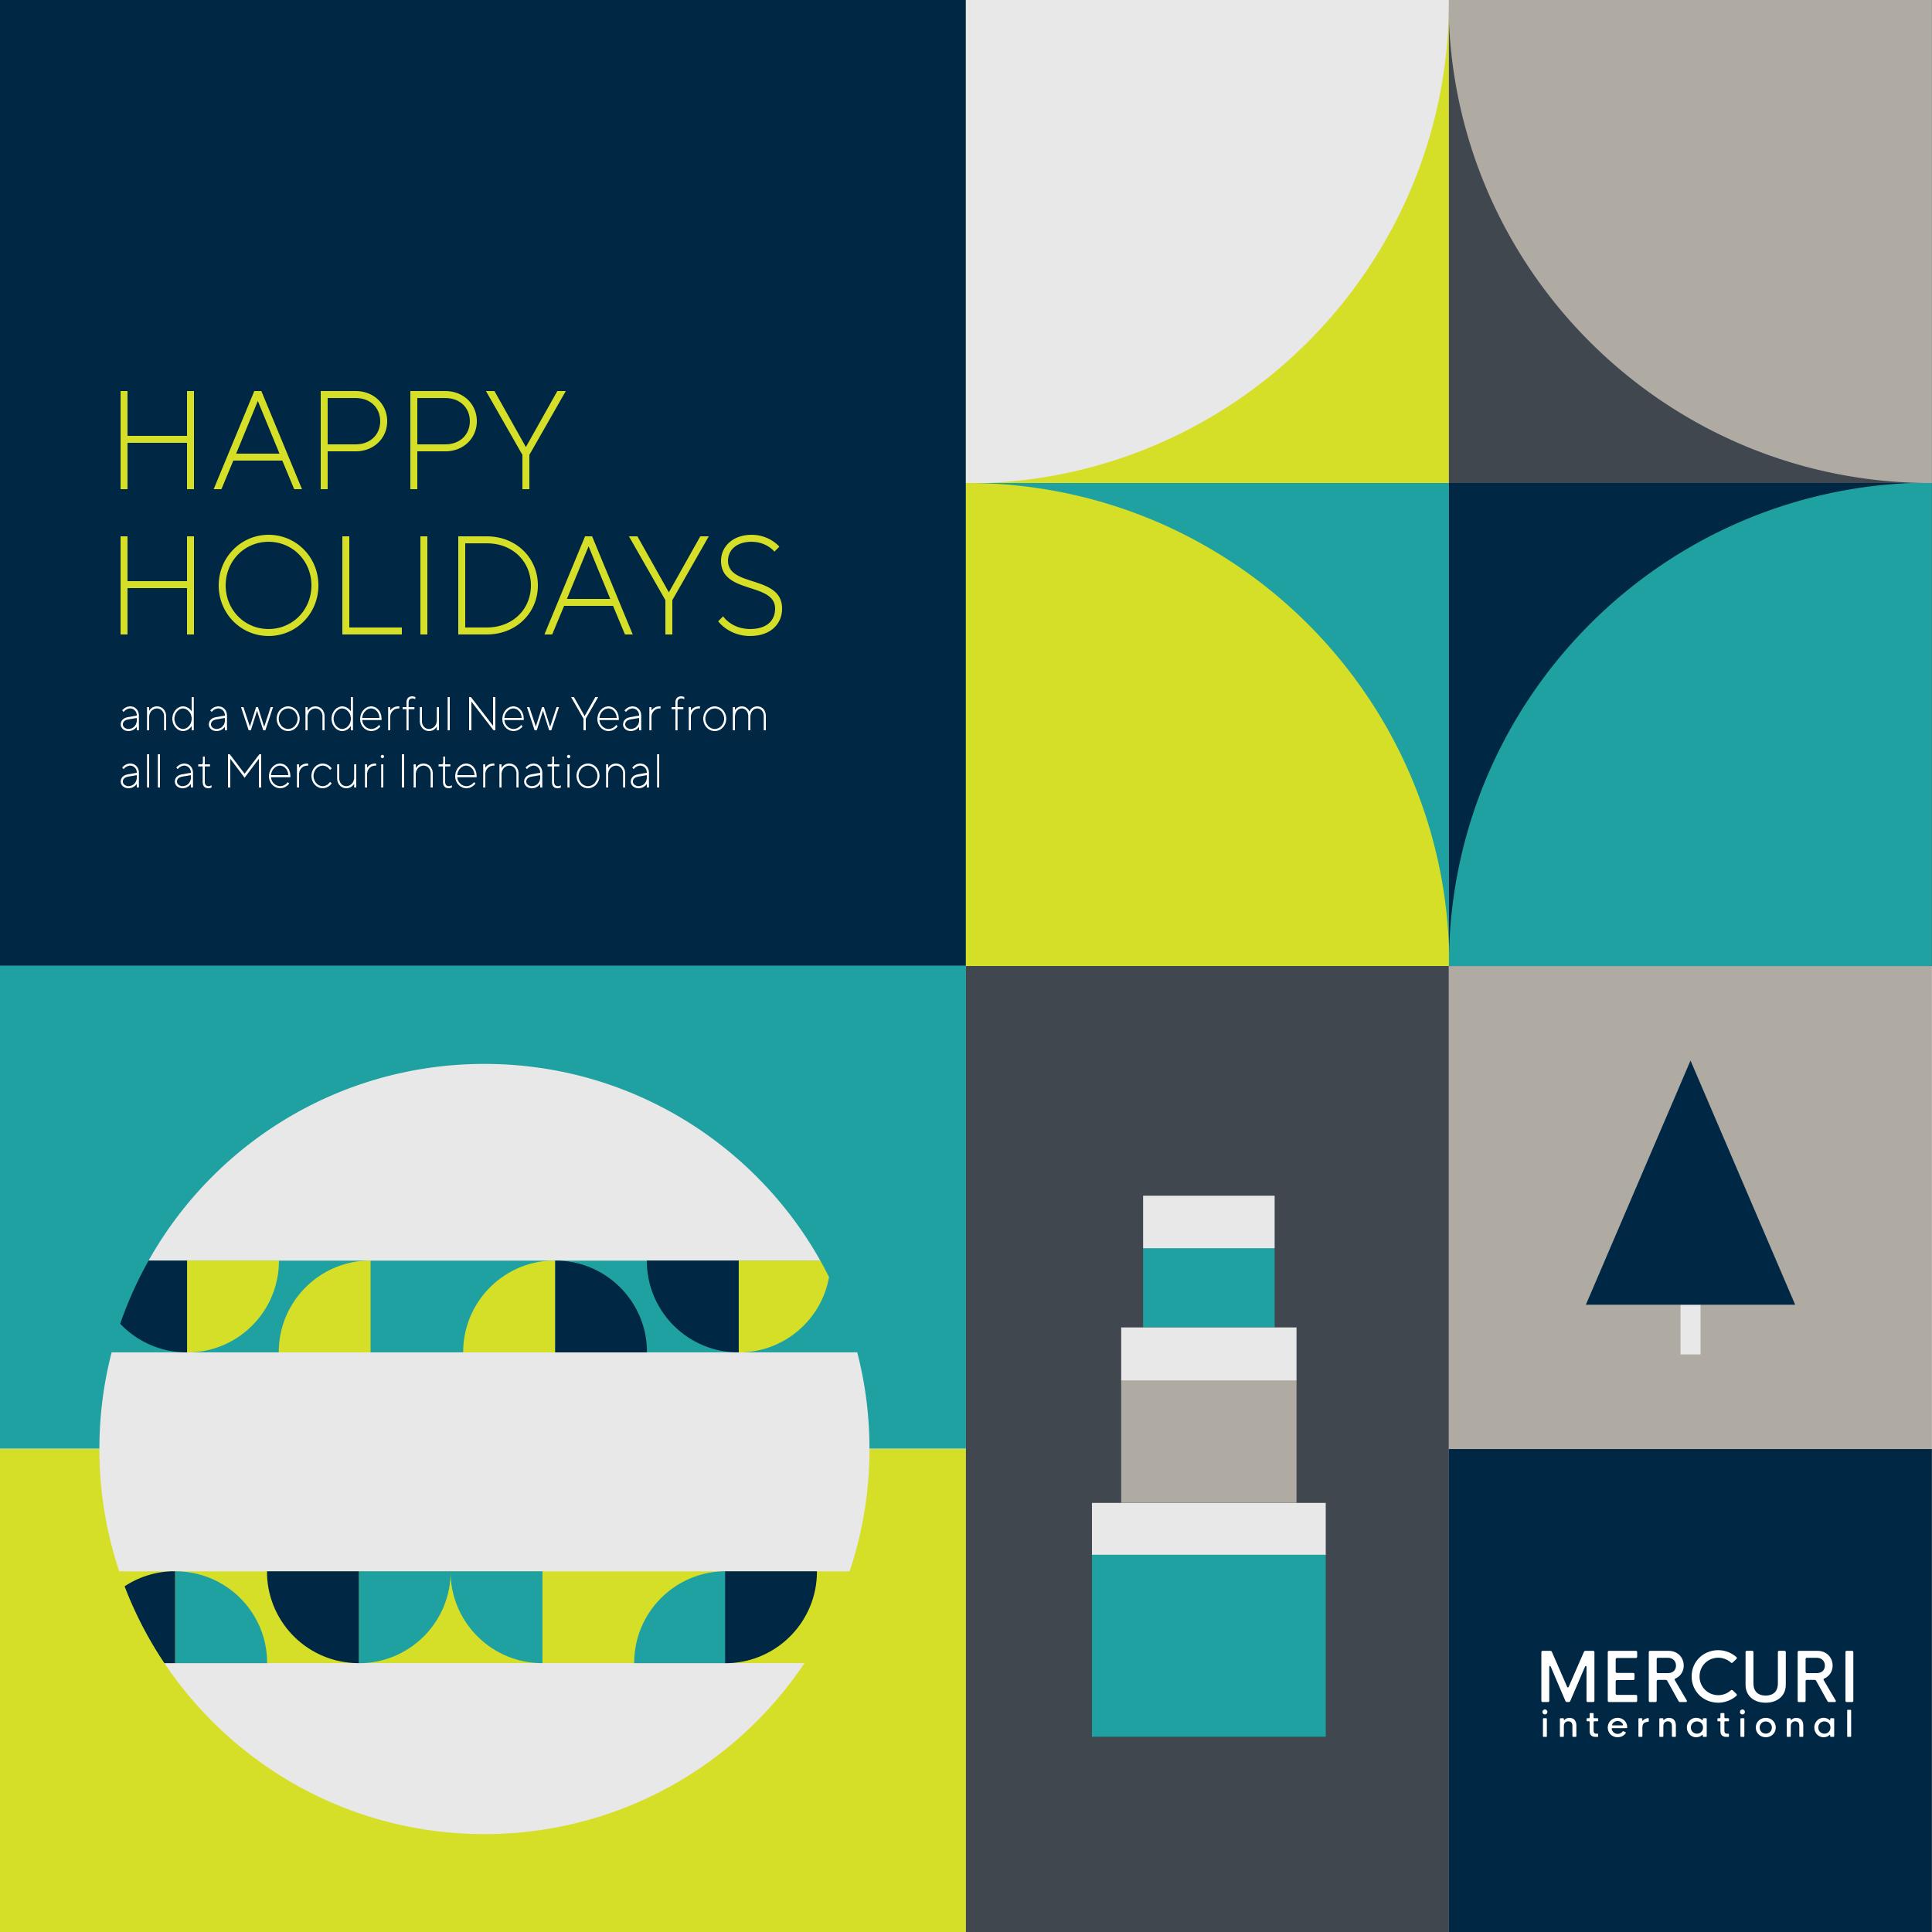 mer_christmas-card-2019_digital_x2